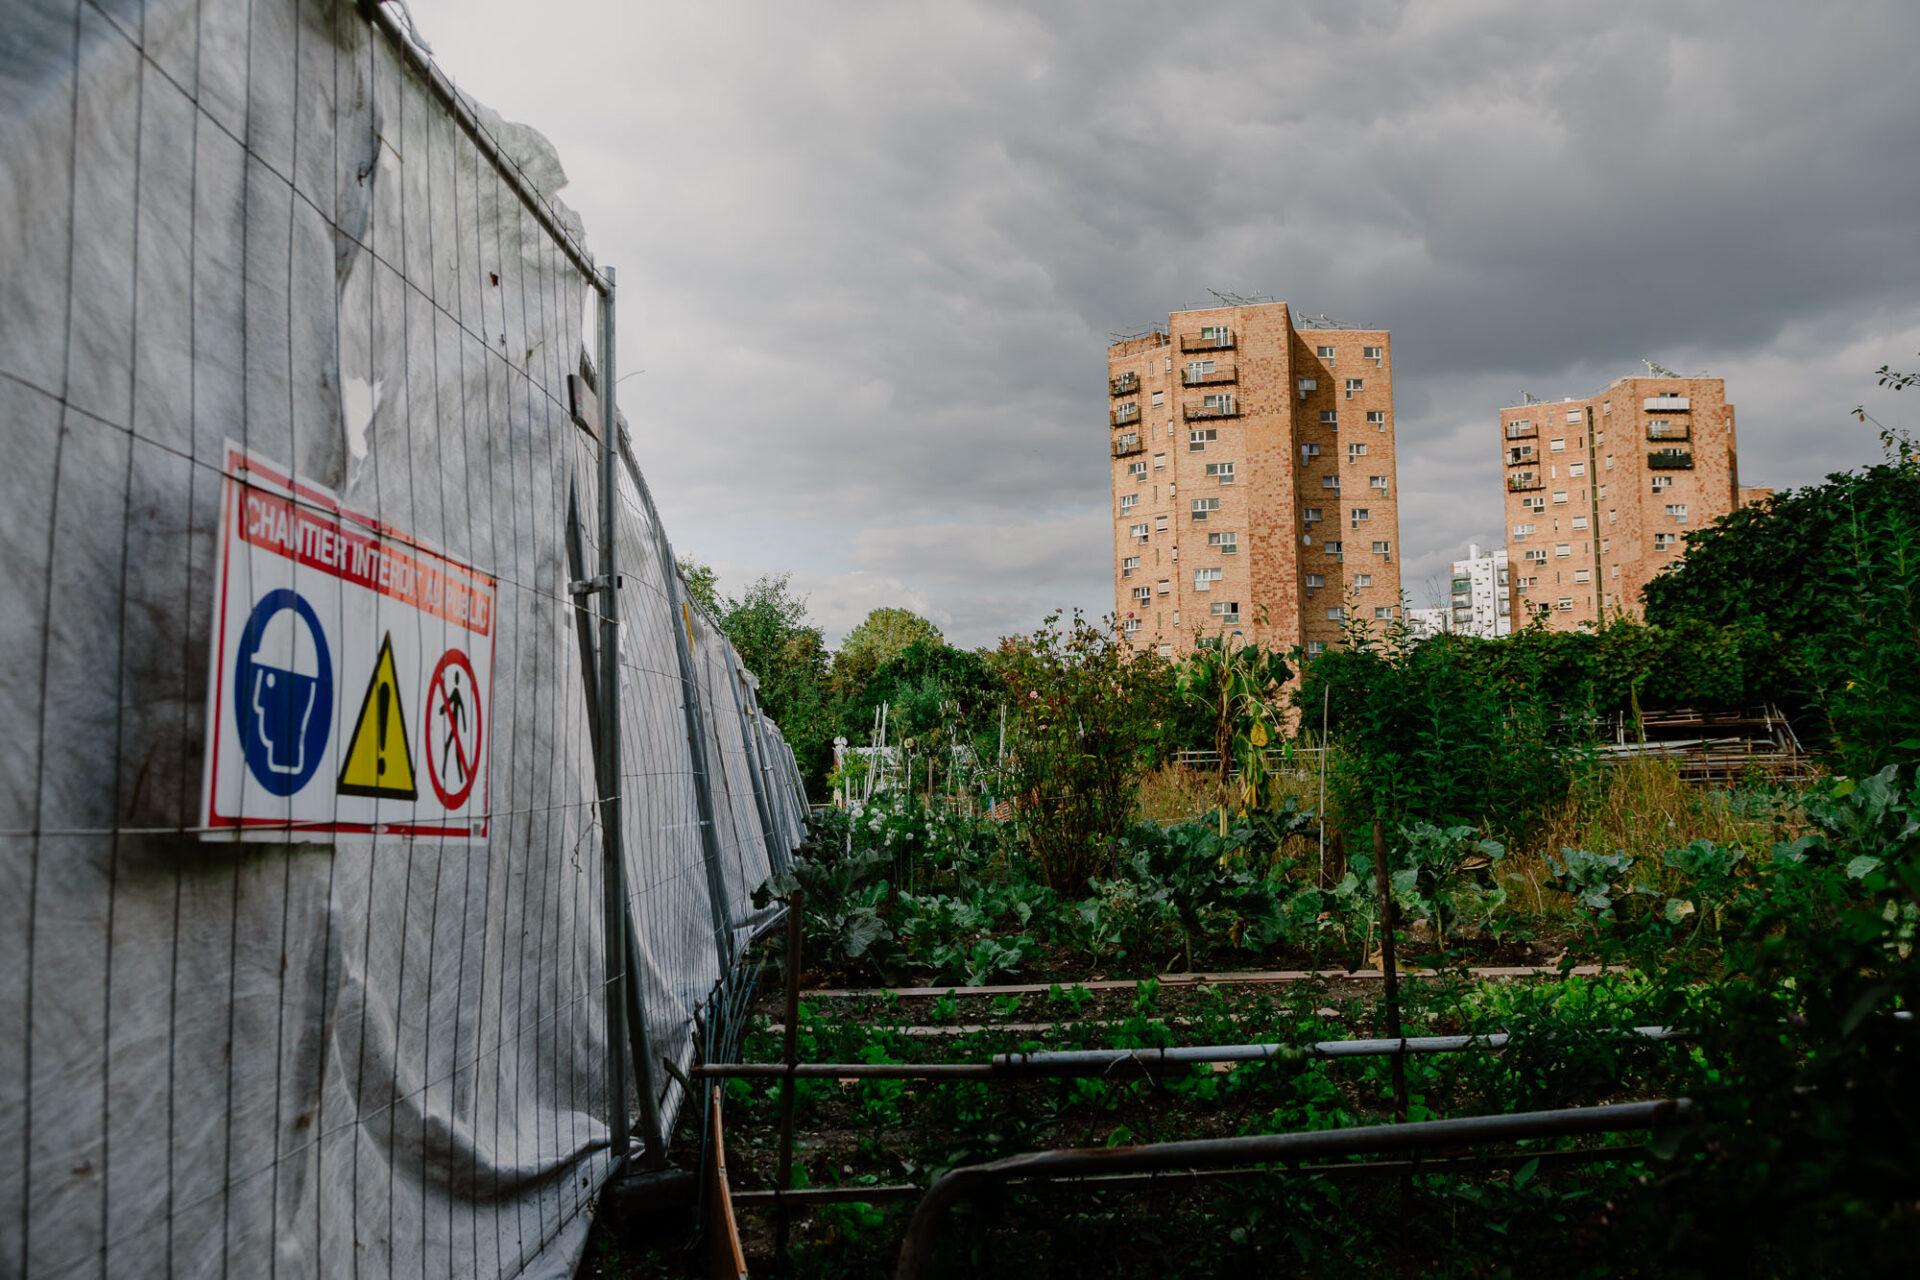 Jardins ouvriers aubervilliers 19 - Dagmara Bojenko - Eco-conscious Weddings, Births & Families